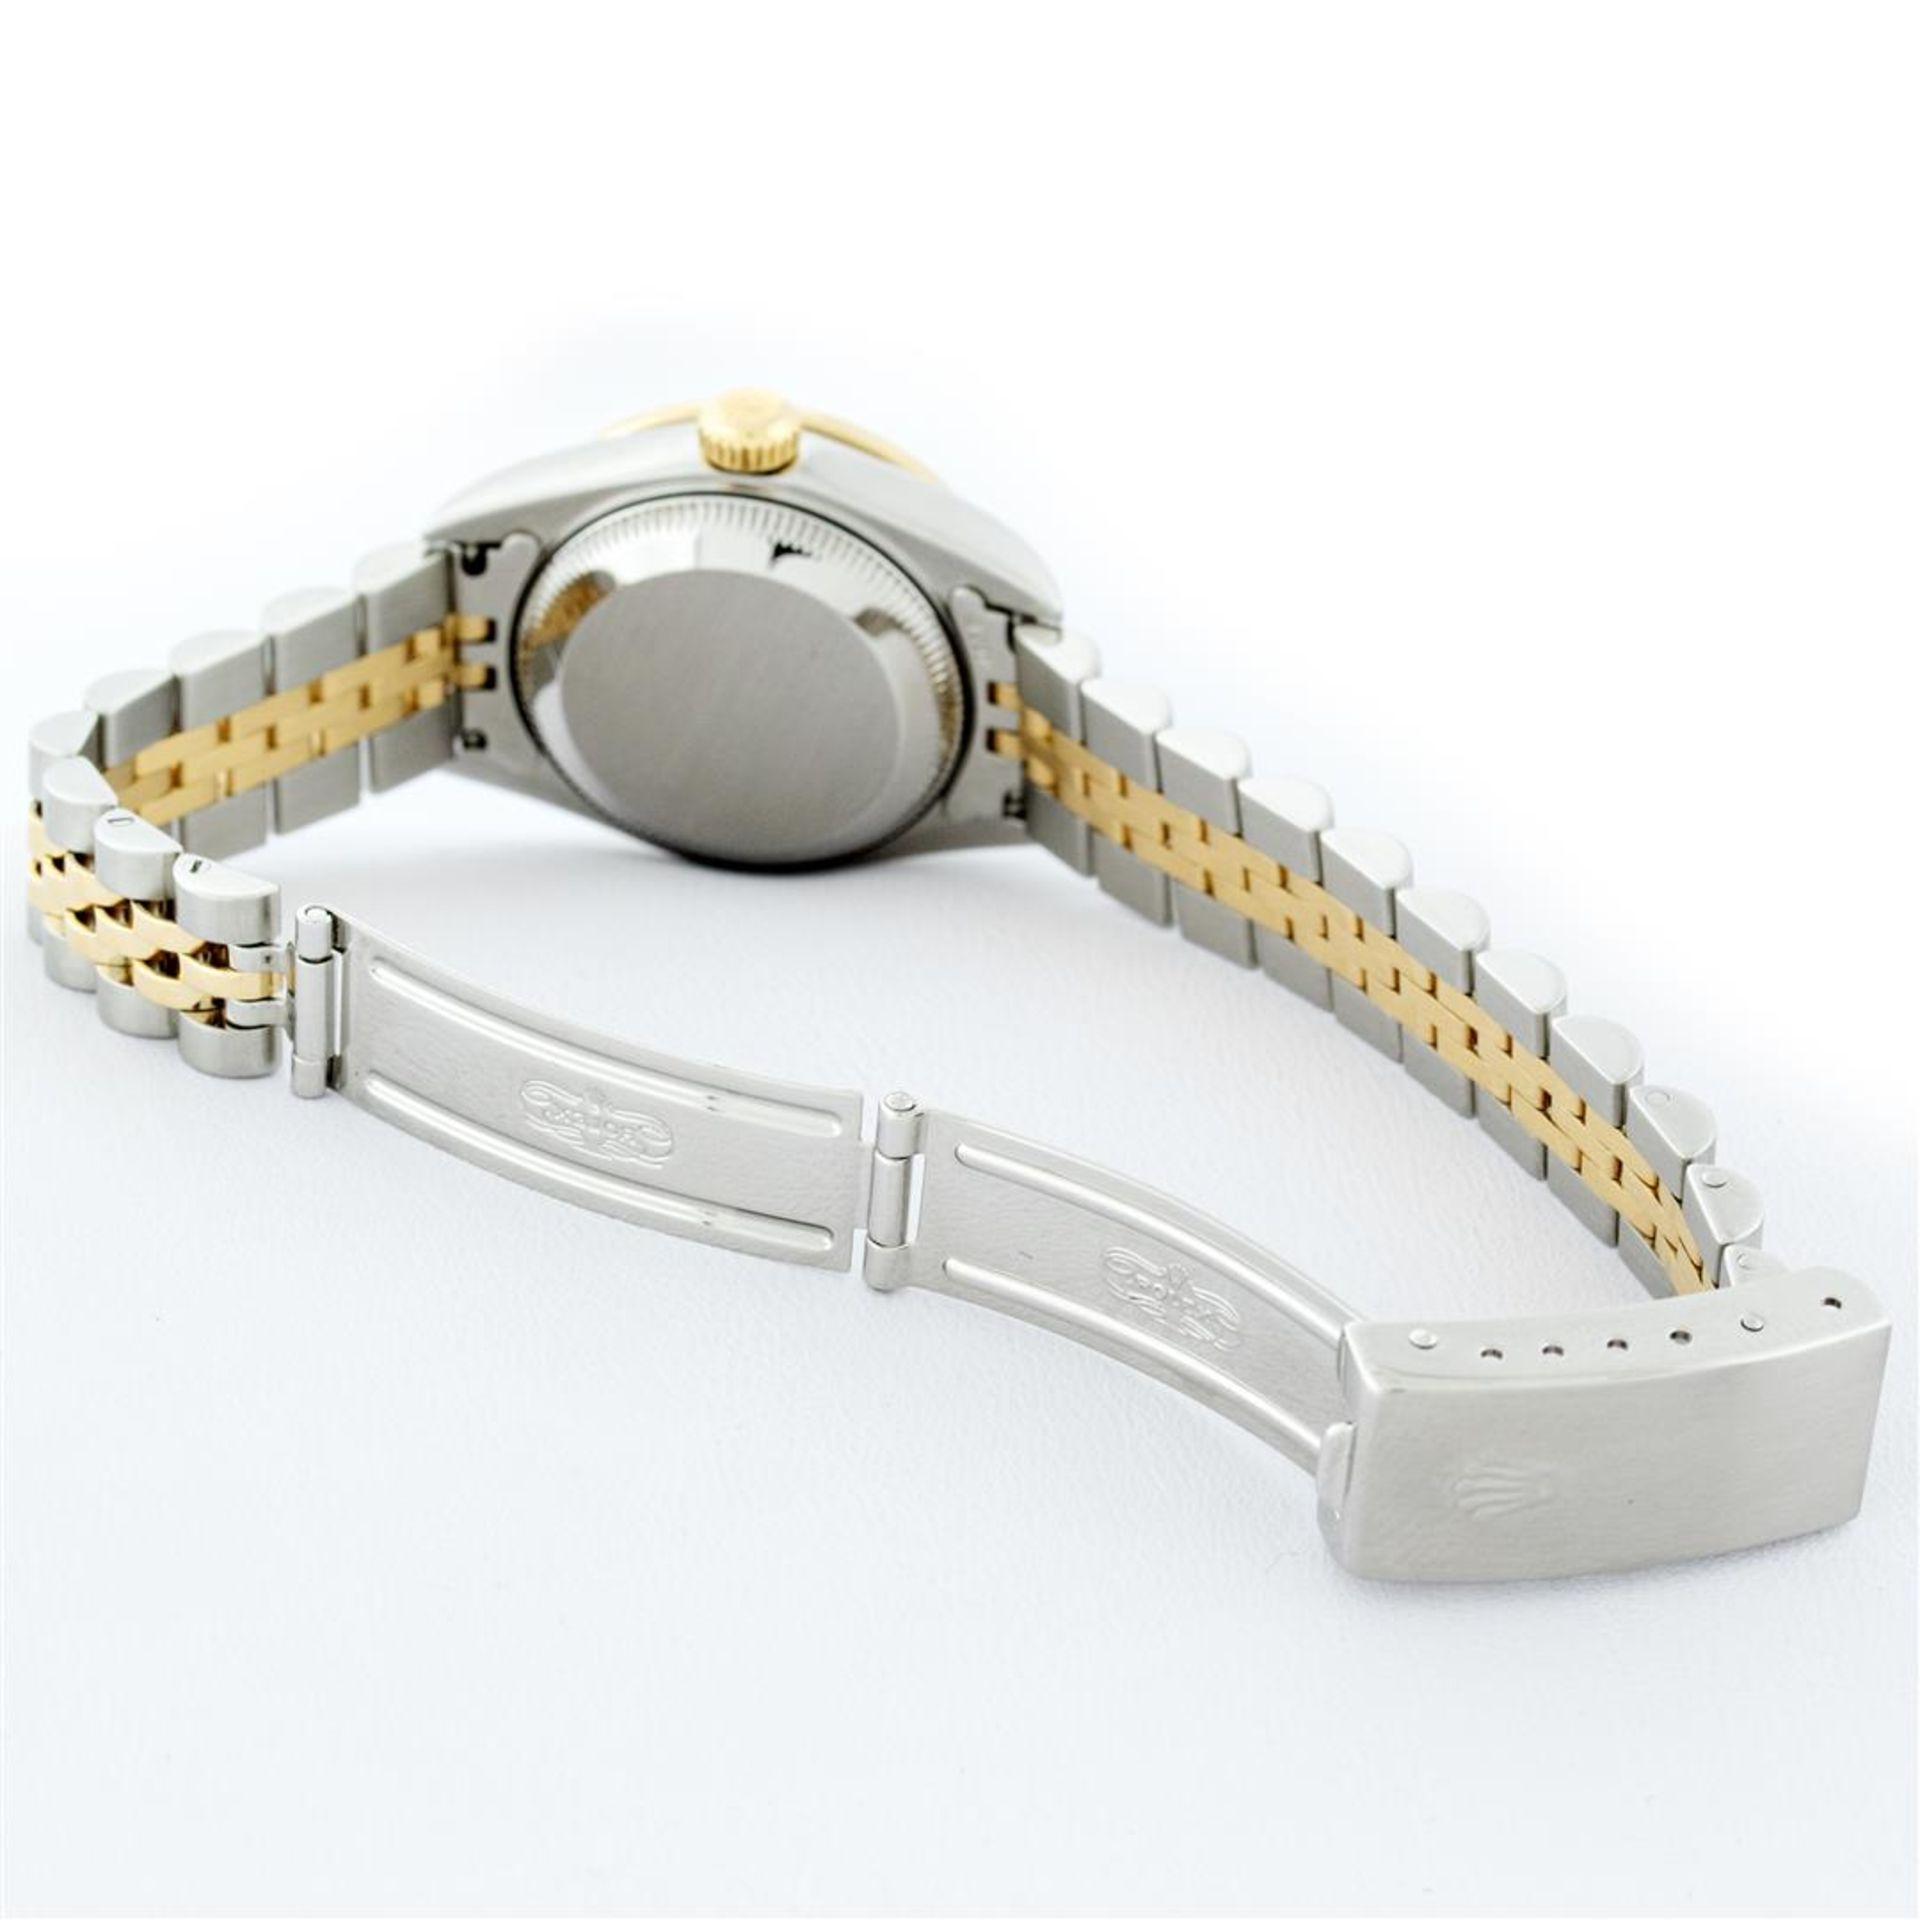 Rolex Ladies 2 Tone 18K Quickset Champagne Diamond & Emerald Datejust Wristwatch - Image 6 of 9